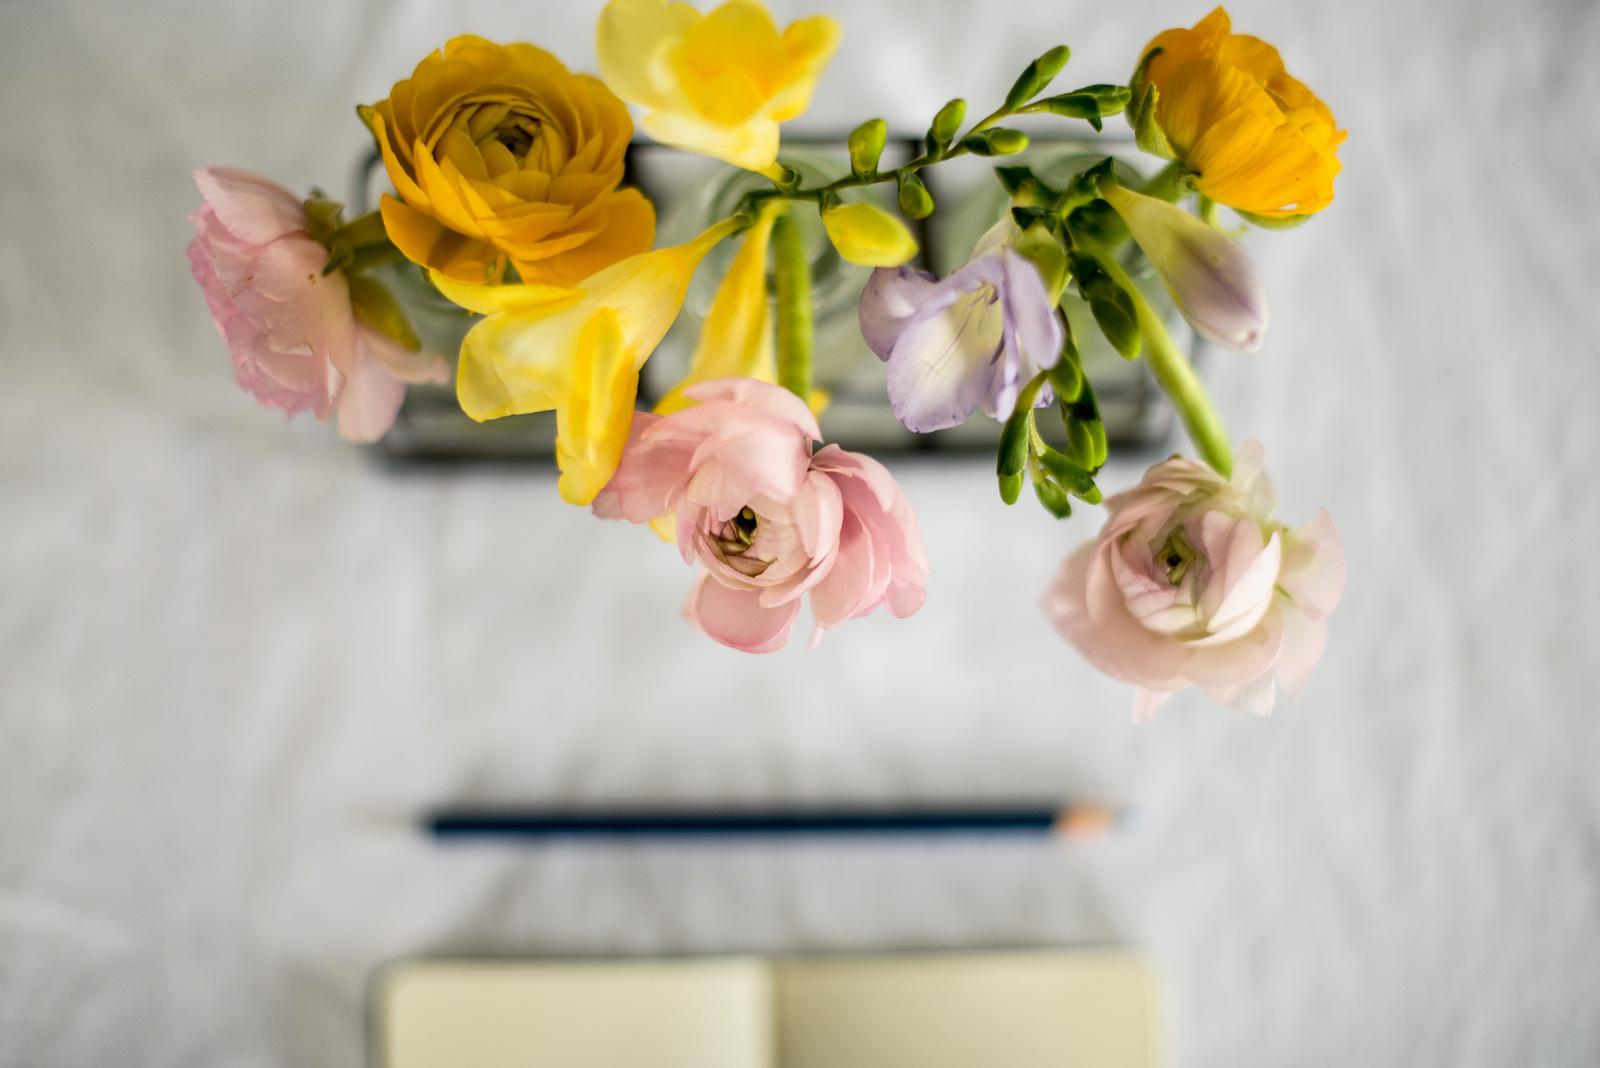 flowers, pencil, notebook